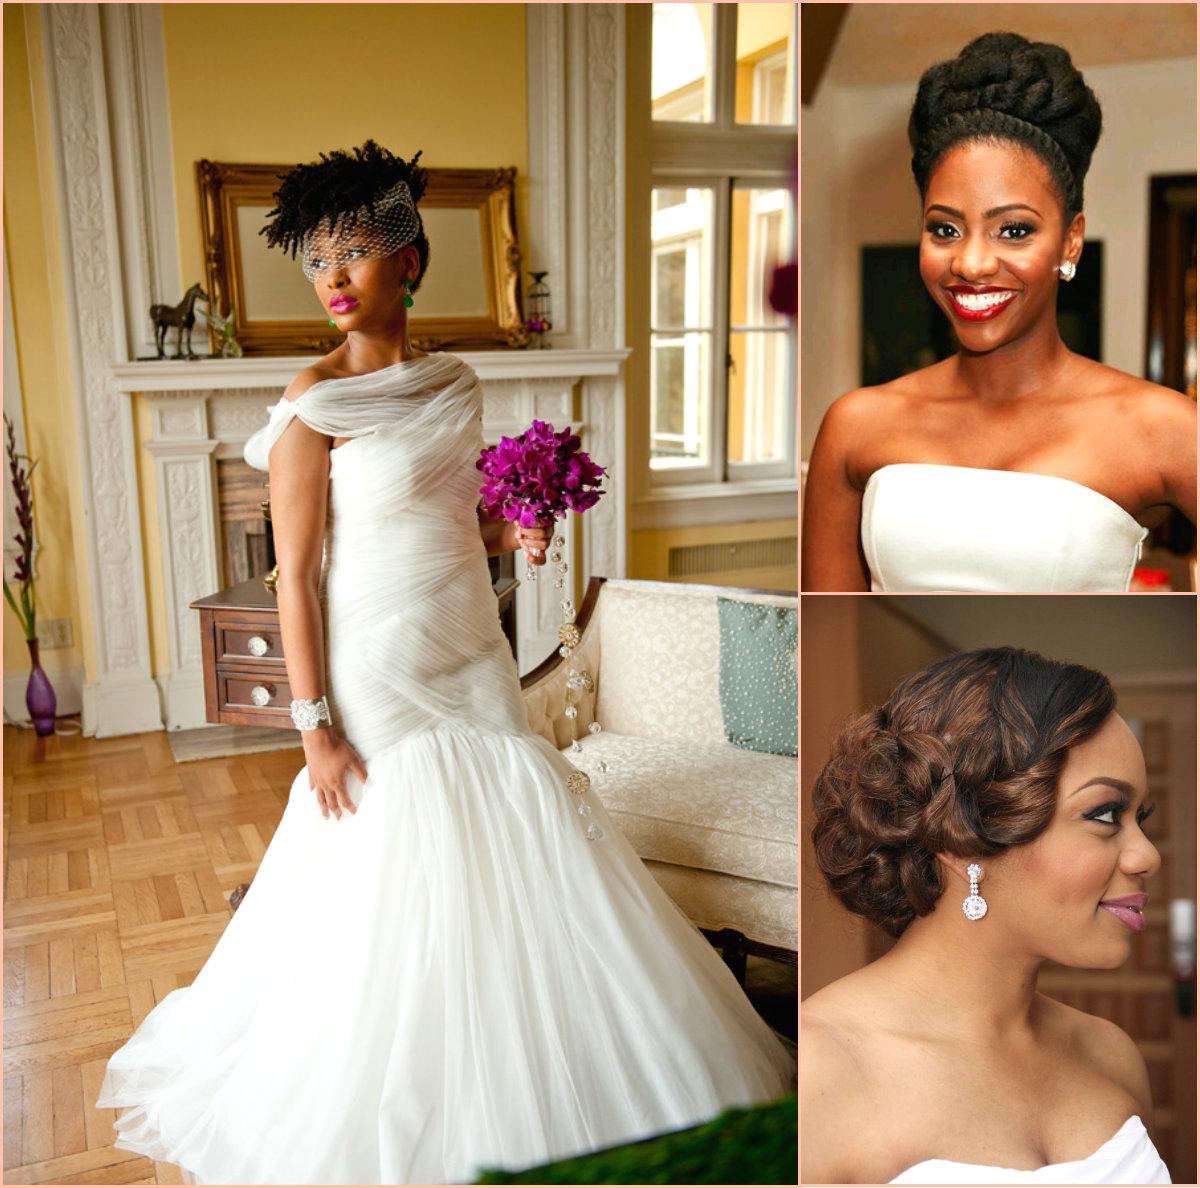 Remarkable Charming Black Women Wedding Hairstyles Hairstyles 2017 Hair Hairstyle Inspiration Daily Dogsangcom